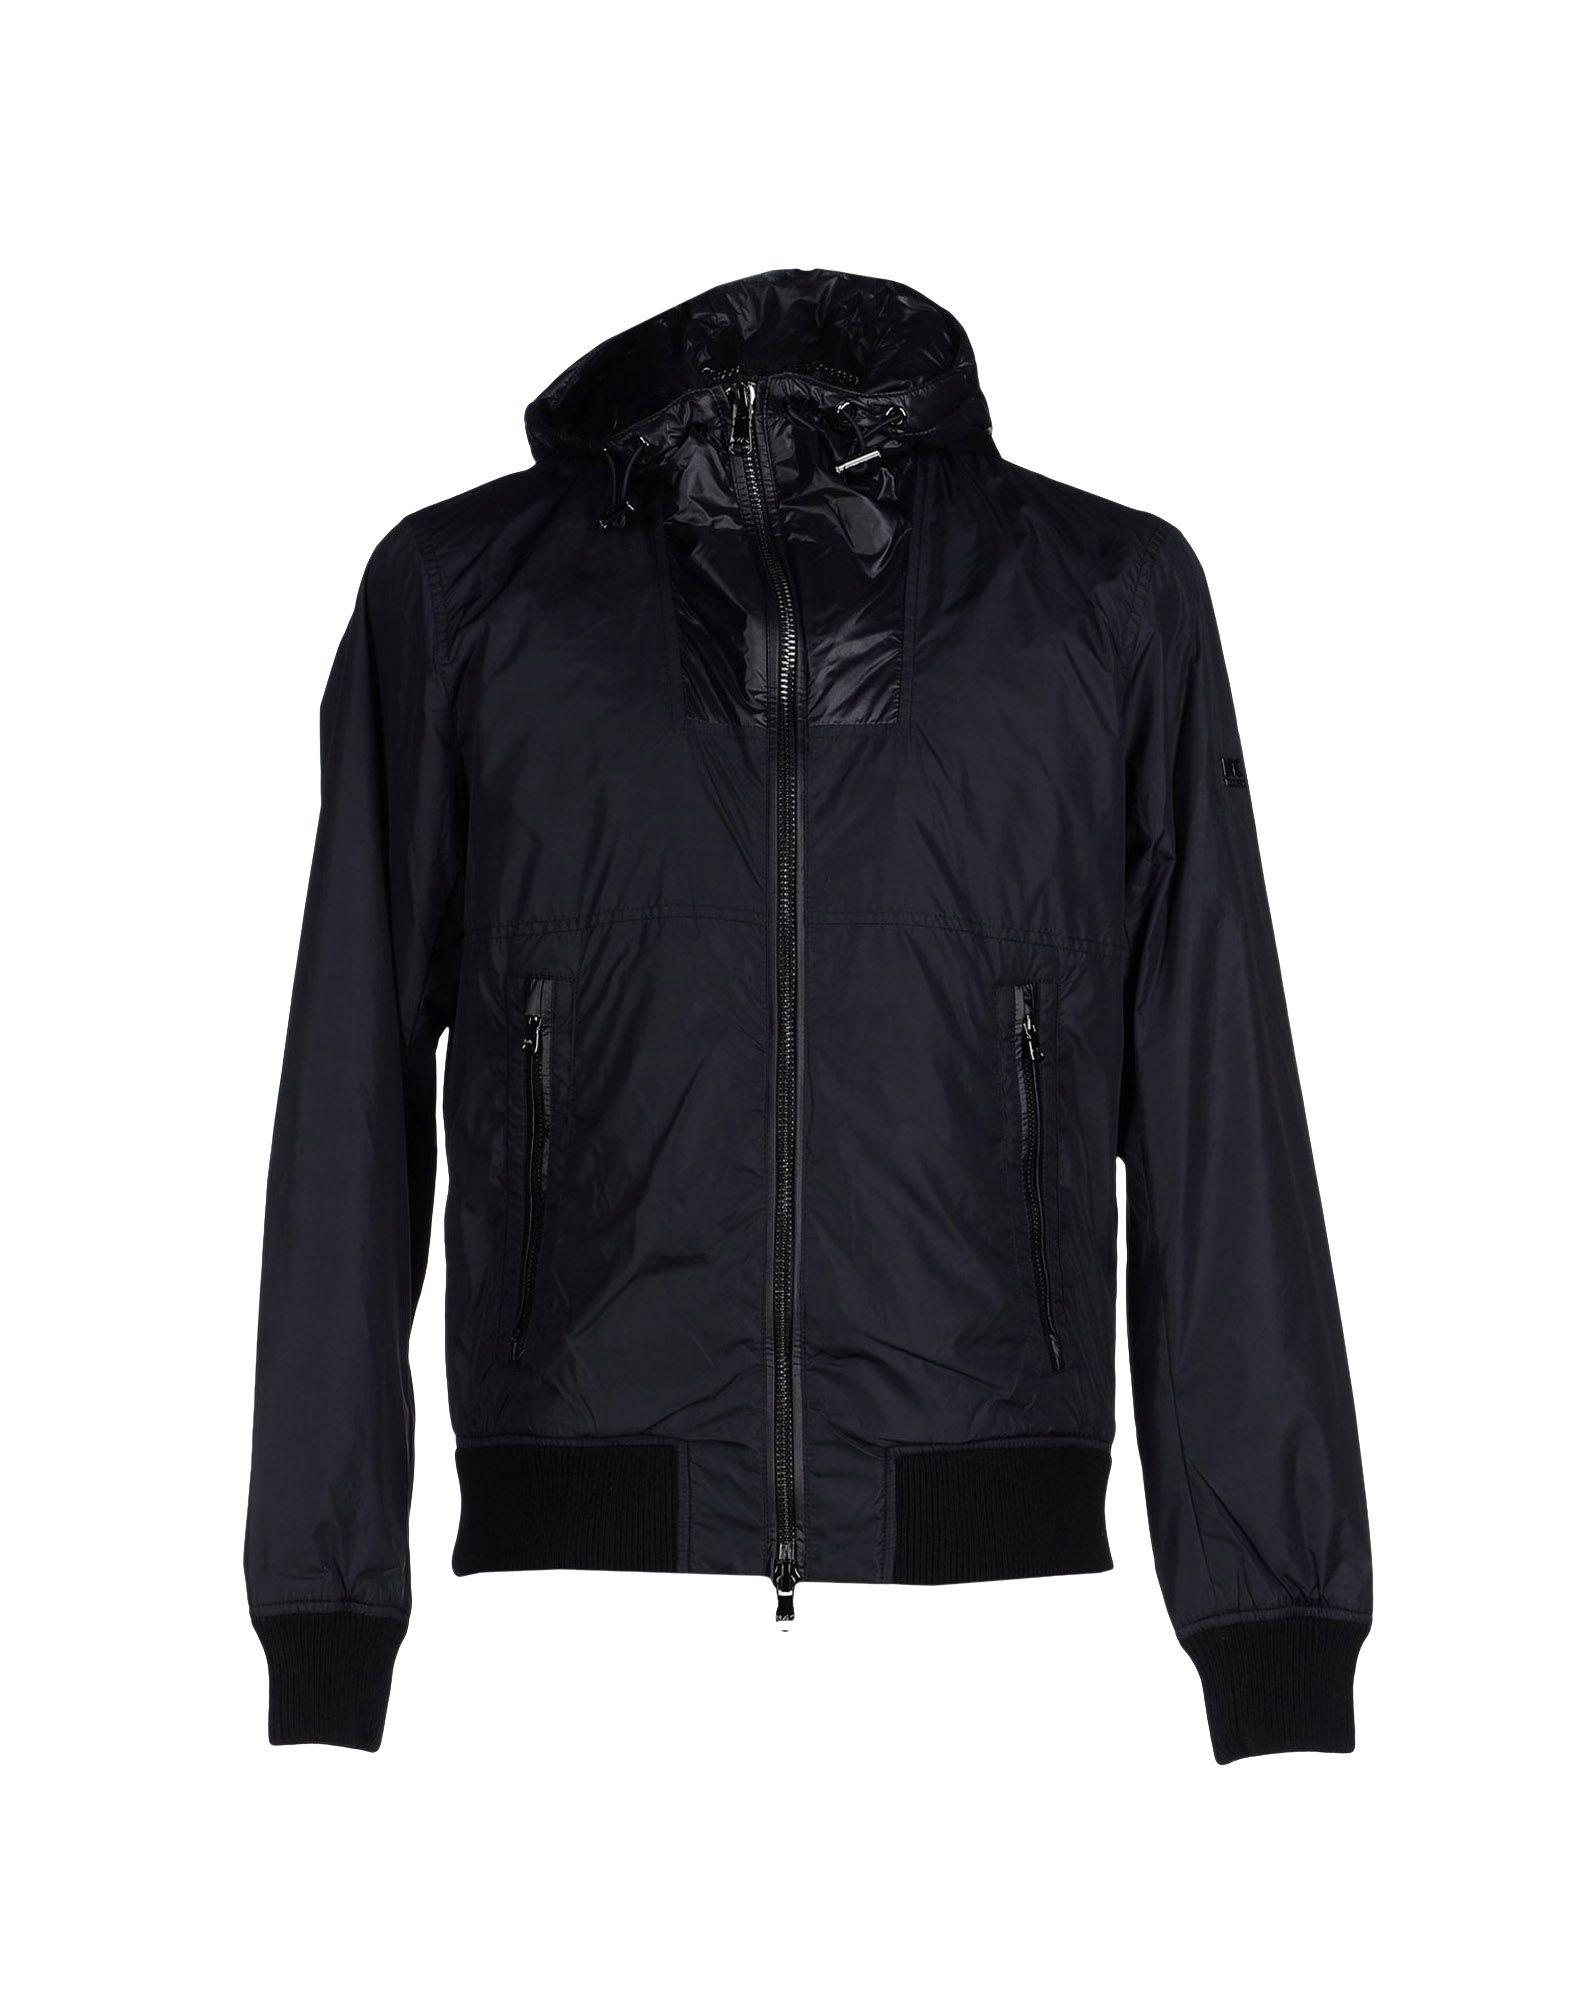 Lyst Michael Kors Jacket In Black For Men